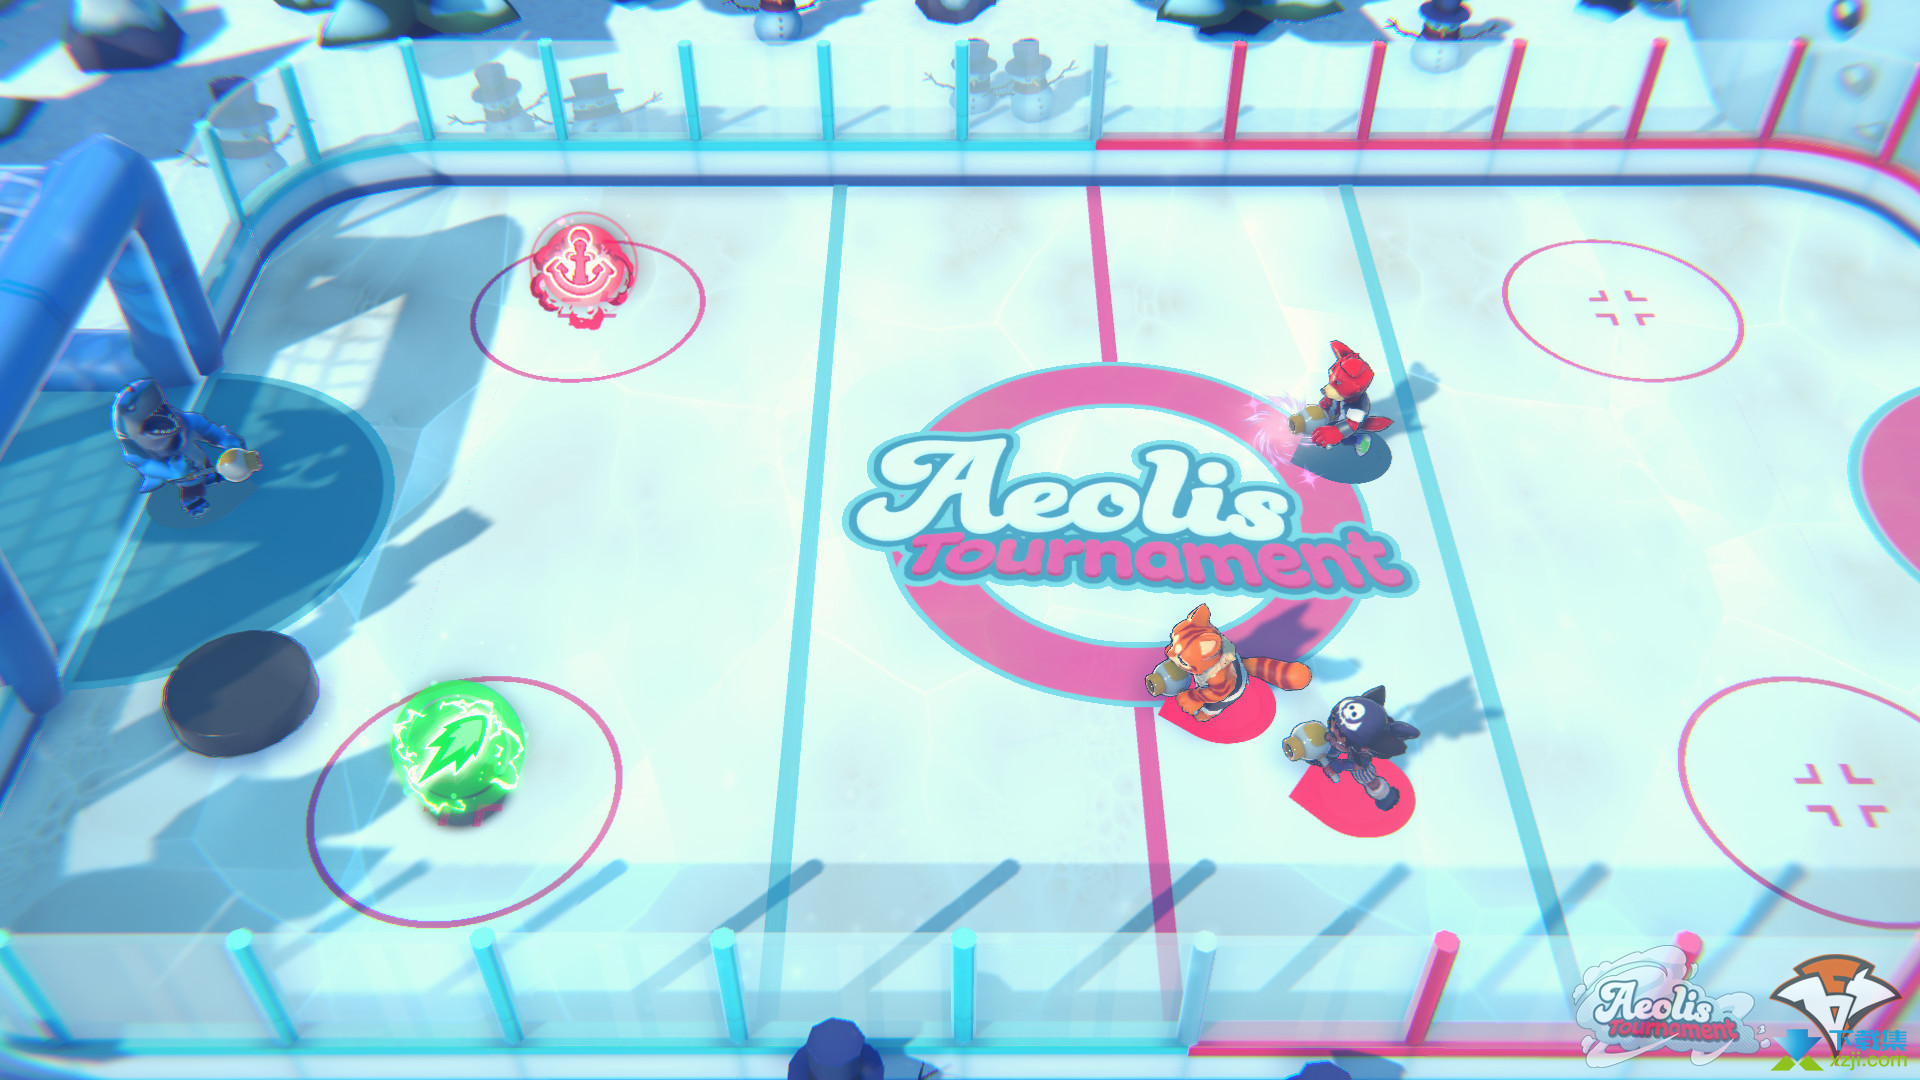 Aeolis Tournament界面4